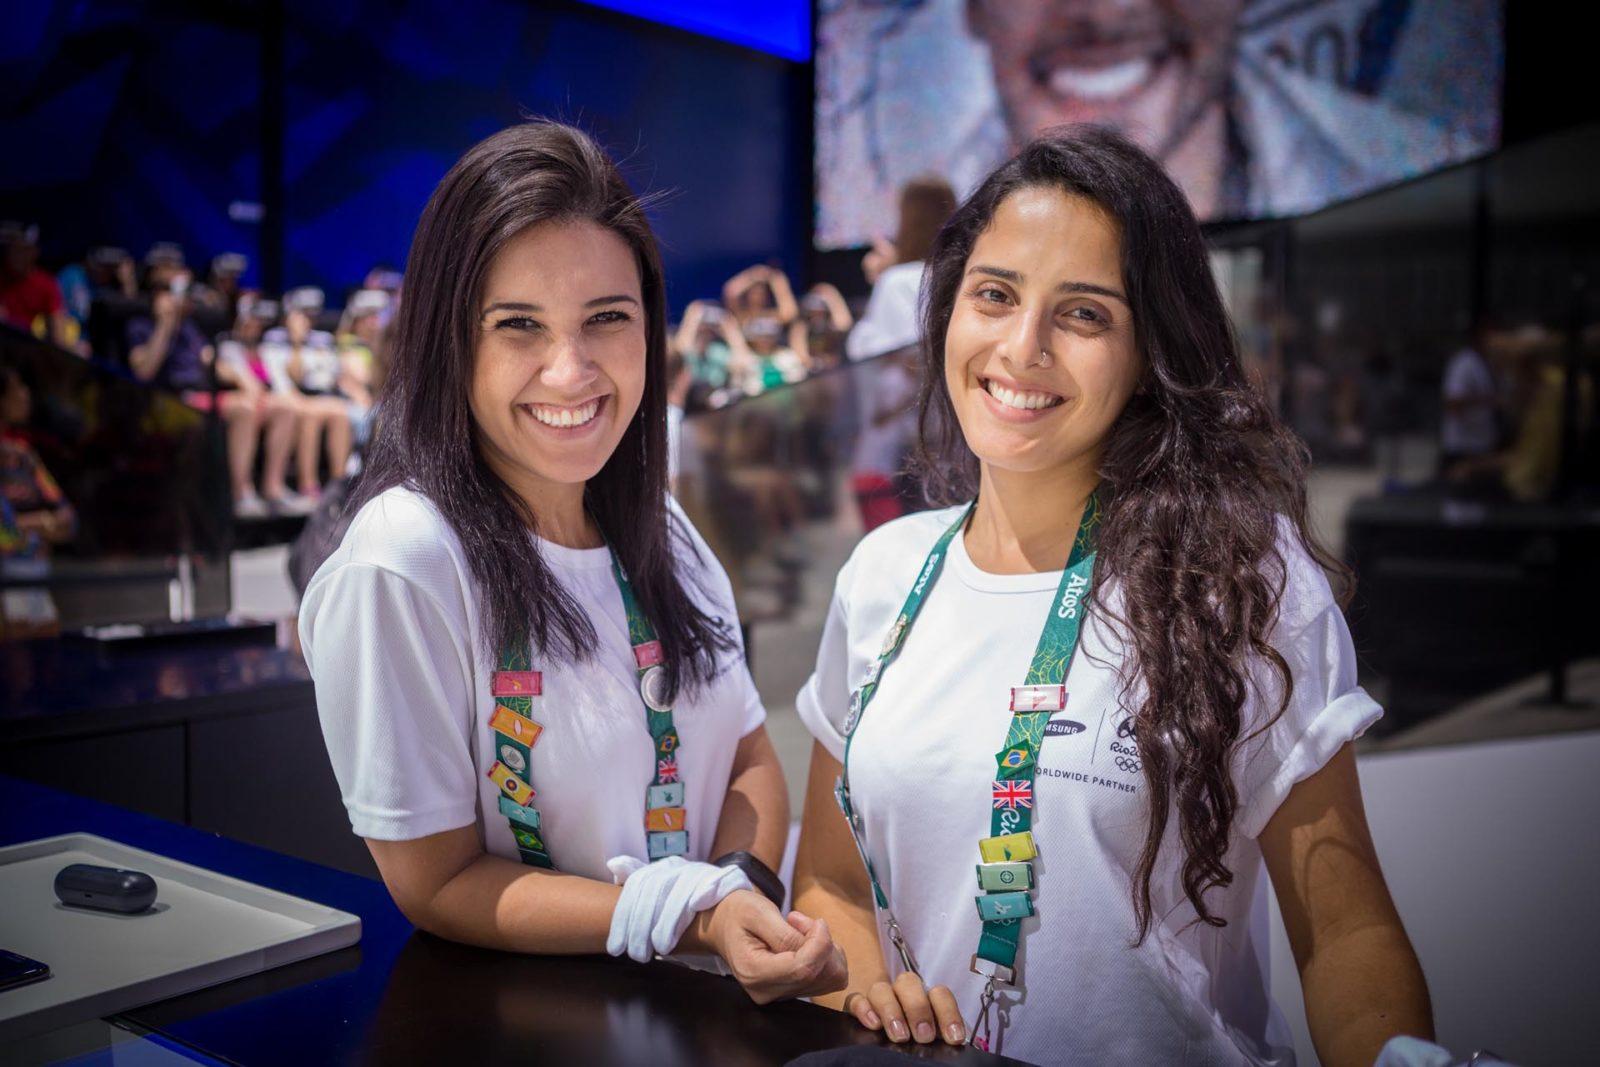 Rio Olympics 2016 Purity